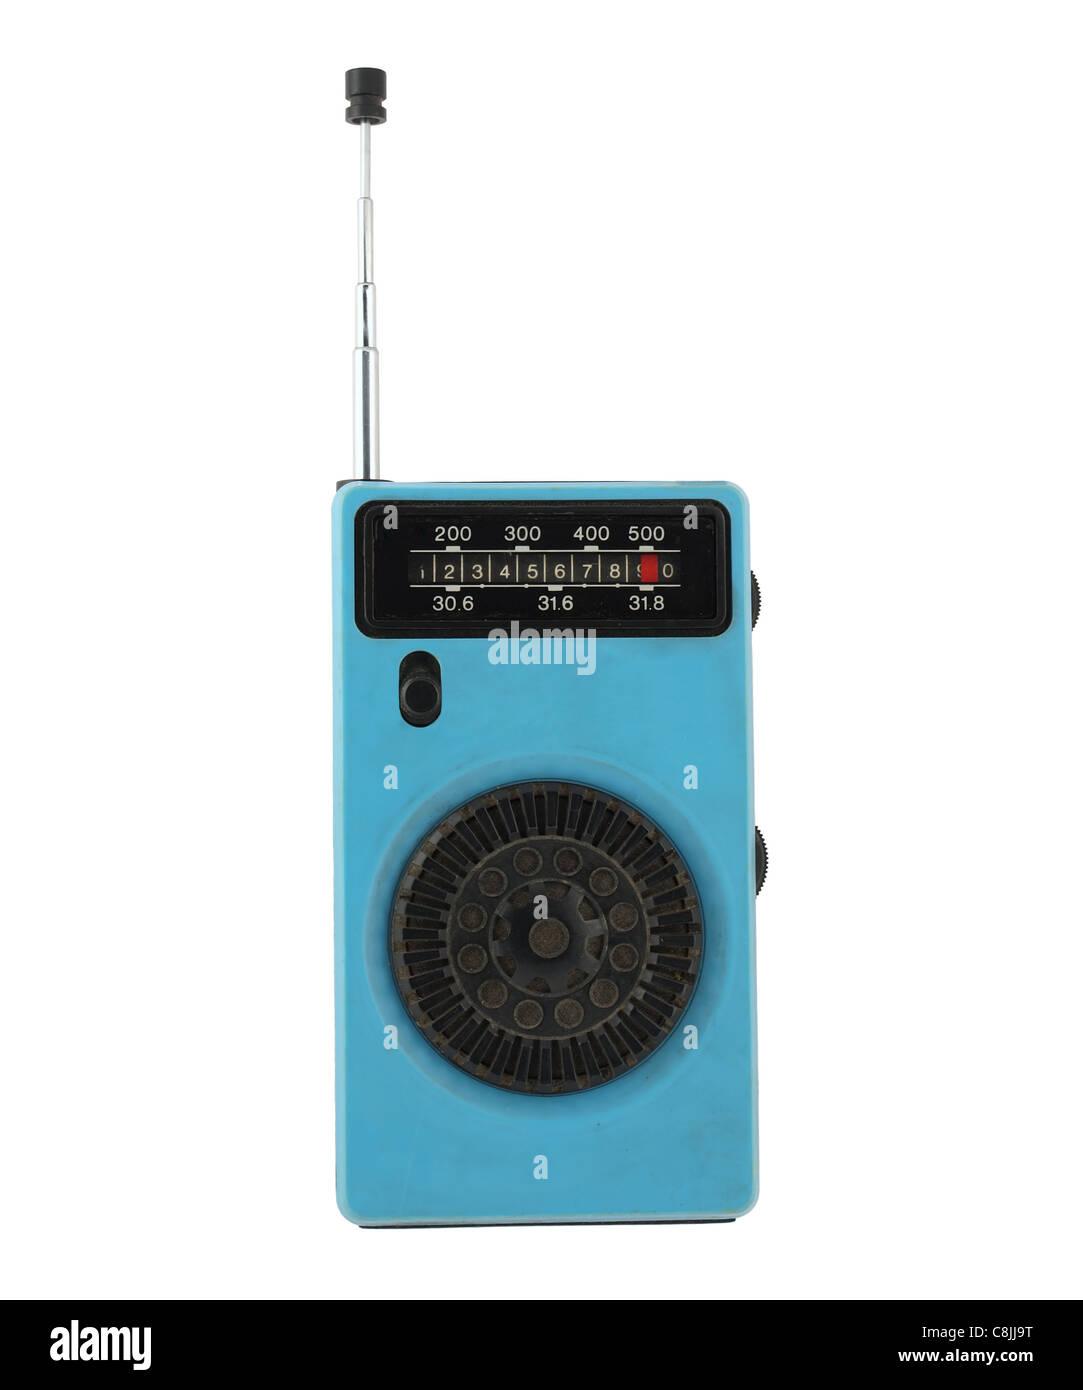 Vintage retro portable radio isolated on white background Stock Photo